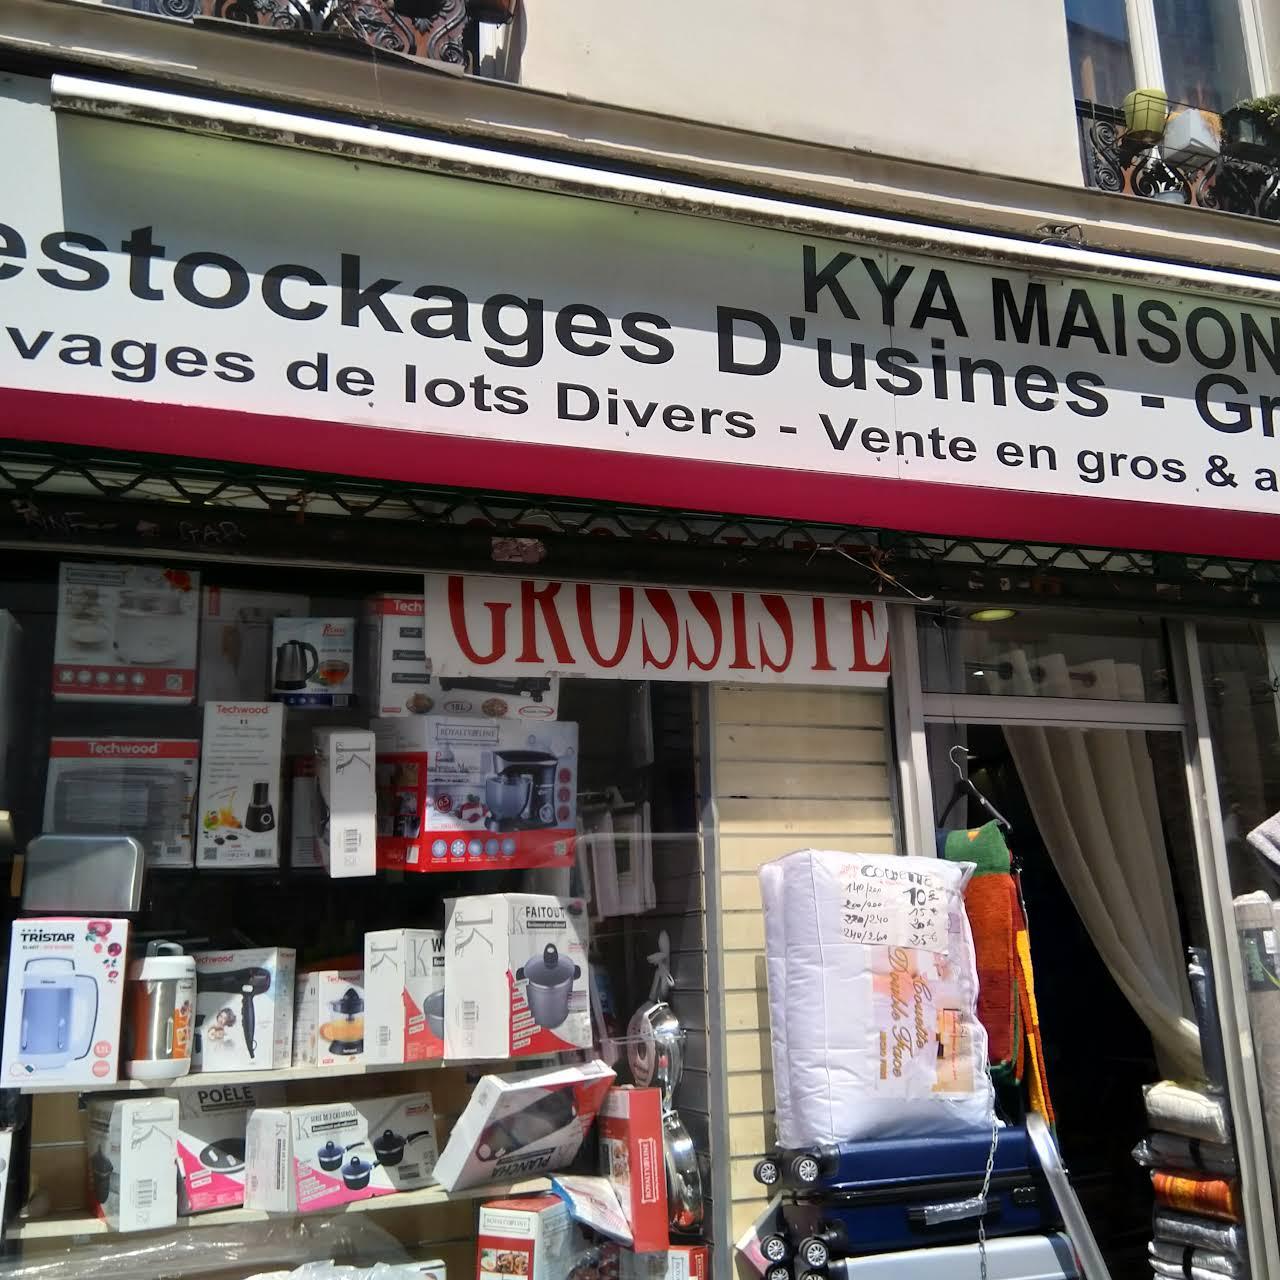 Aubervilliers Grossiste Linge De Maison kya maison - linge de maison paris 11 détail et grossiste